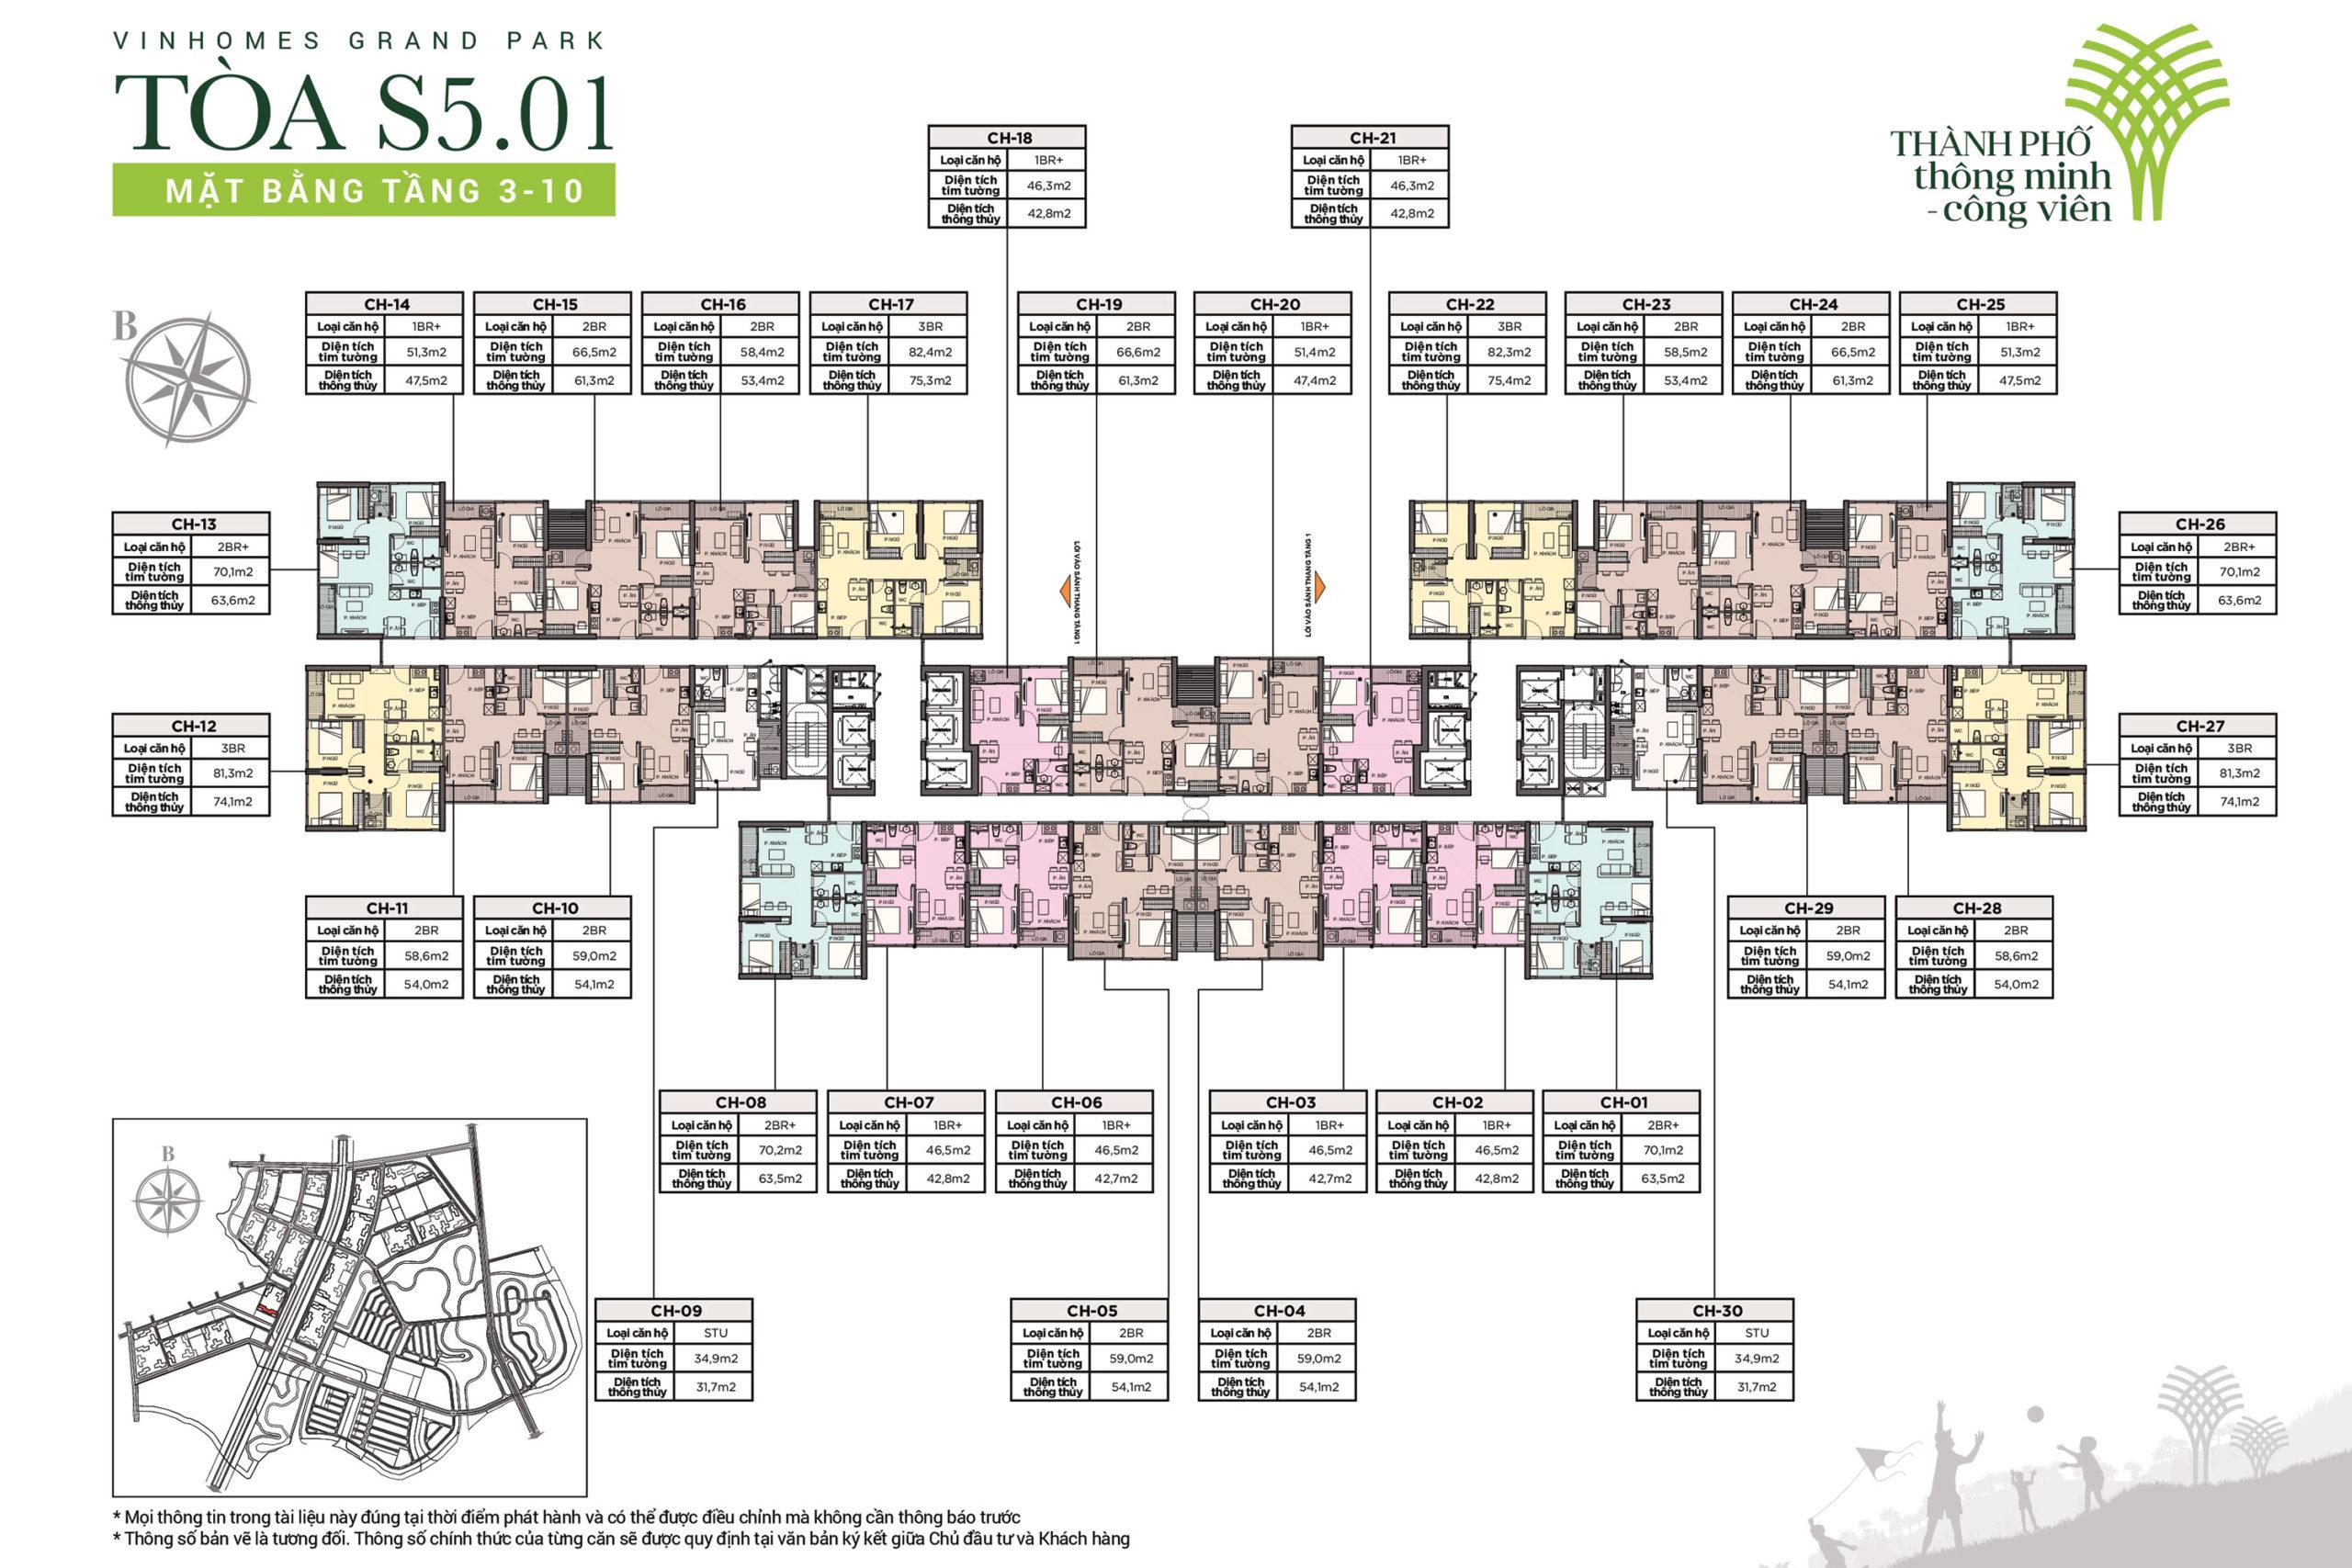 cho thuê căn hộ tòa S5.01 Vinhomes Grand Park - Vincity Quận 9 2